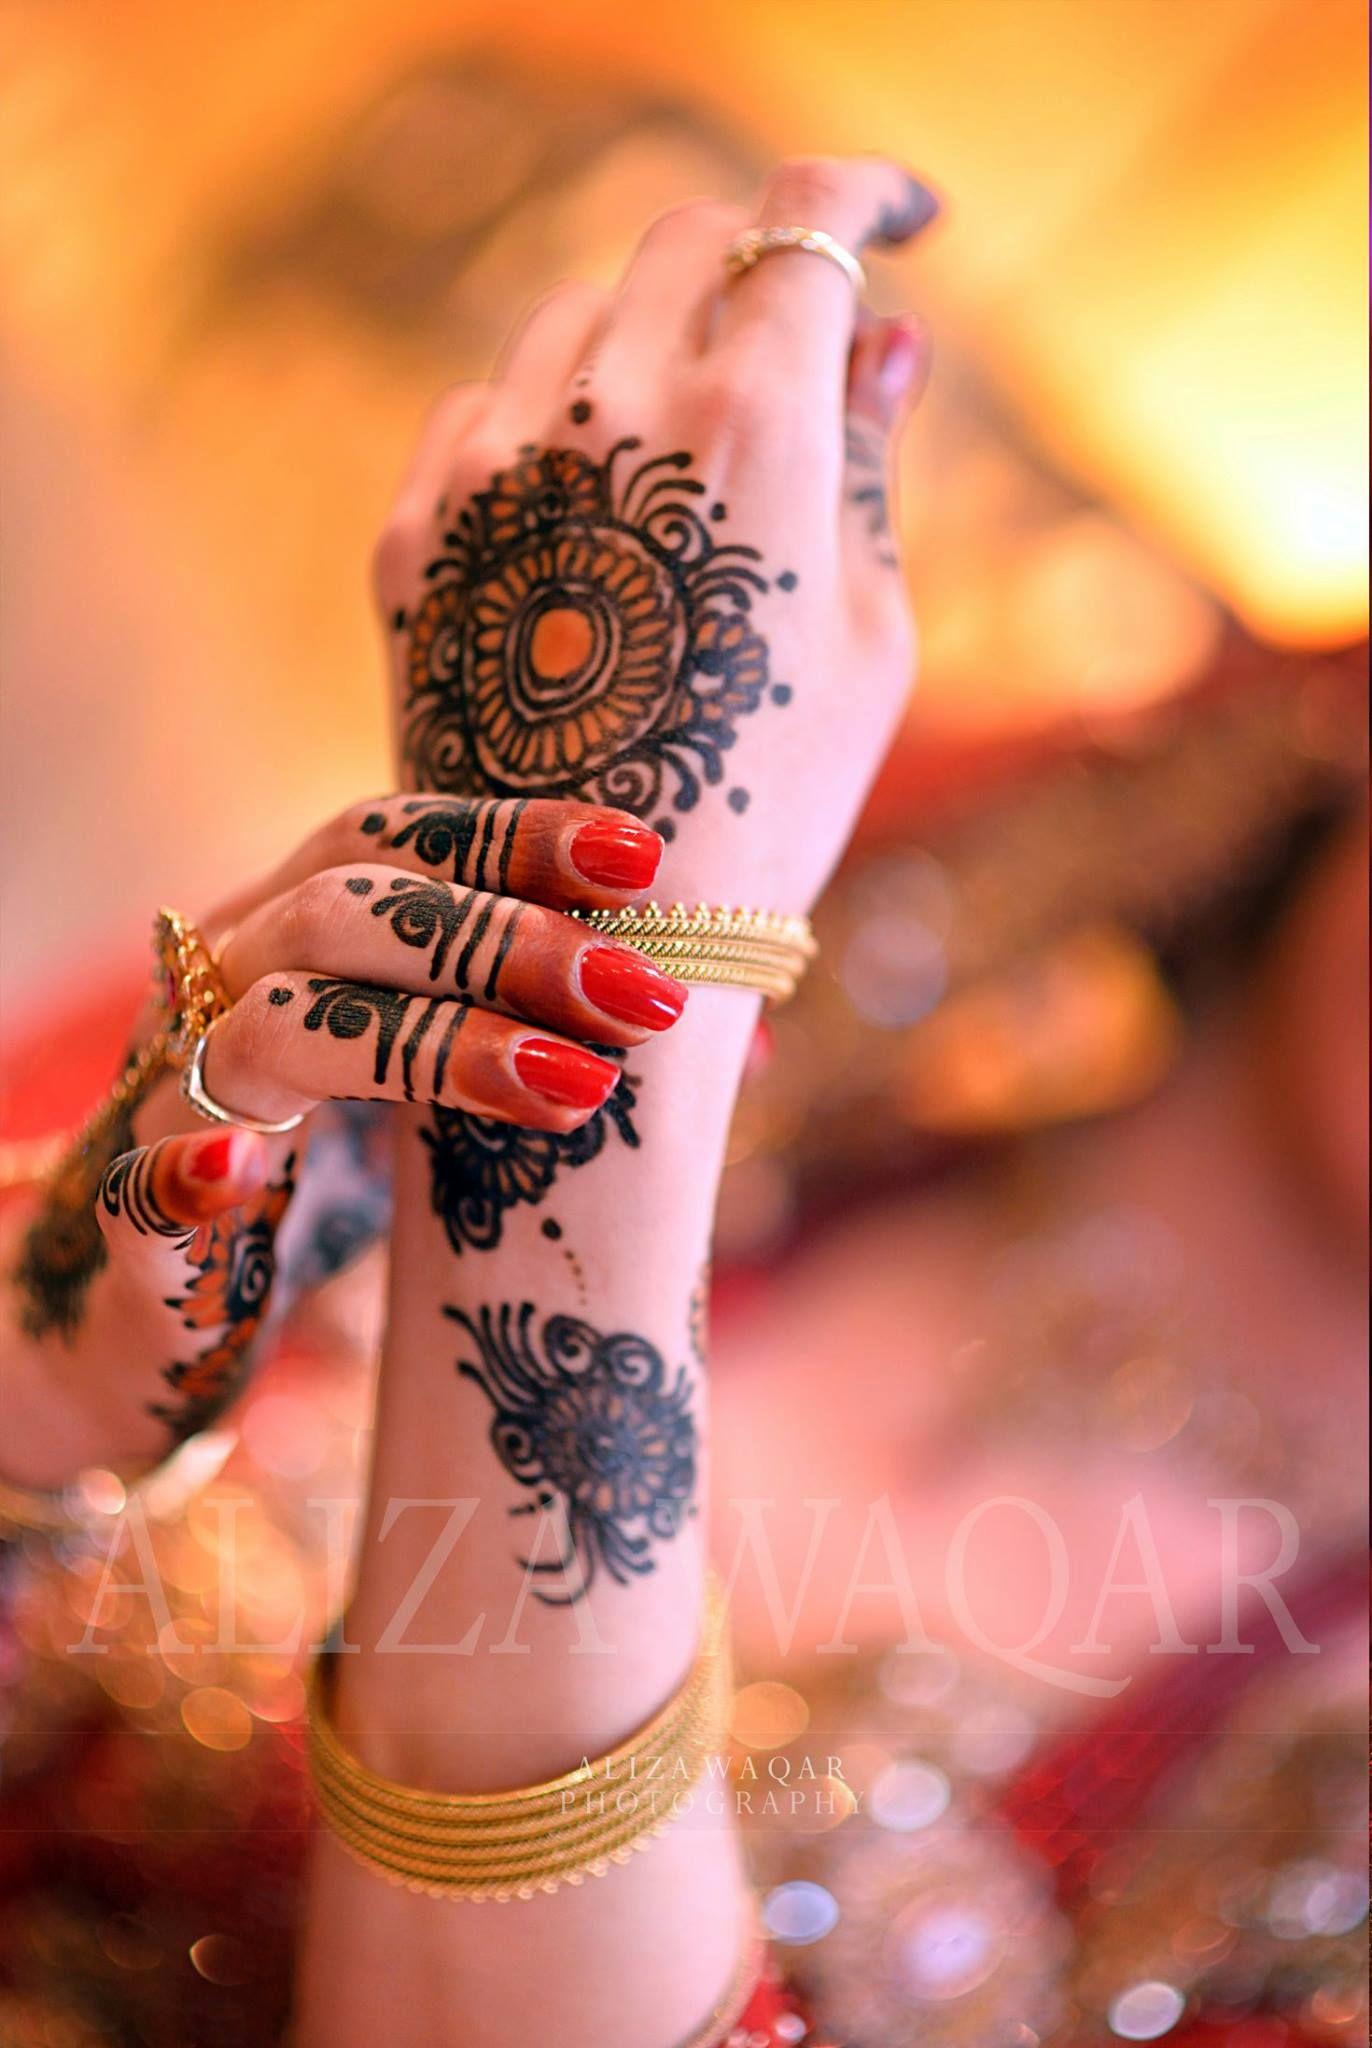 Aliza waqar photography | Mix bridal hands photography